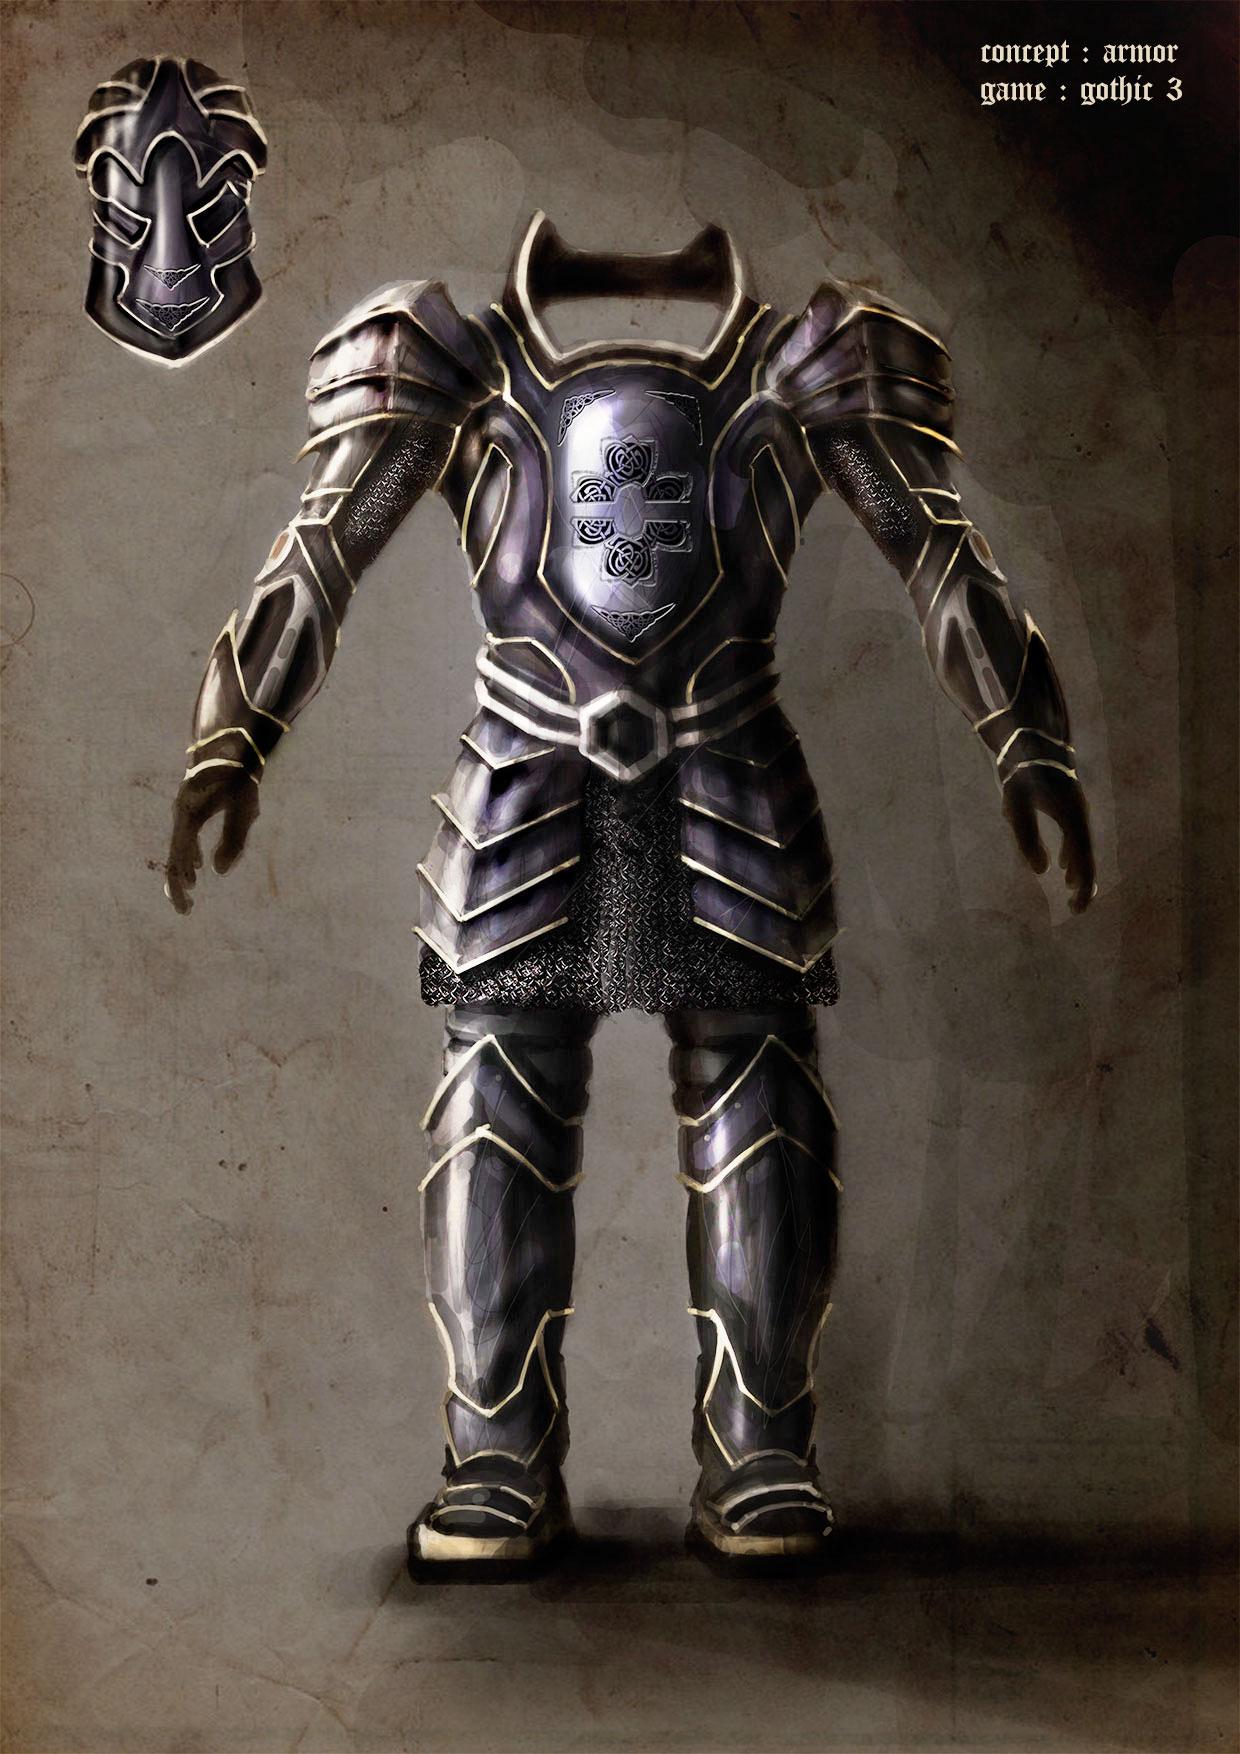 Gothic 4 Armour